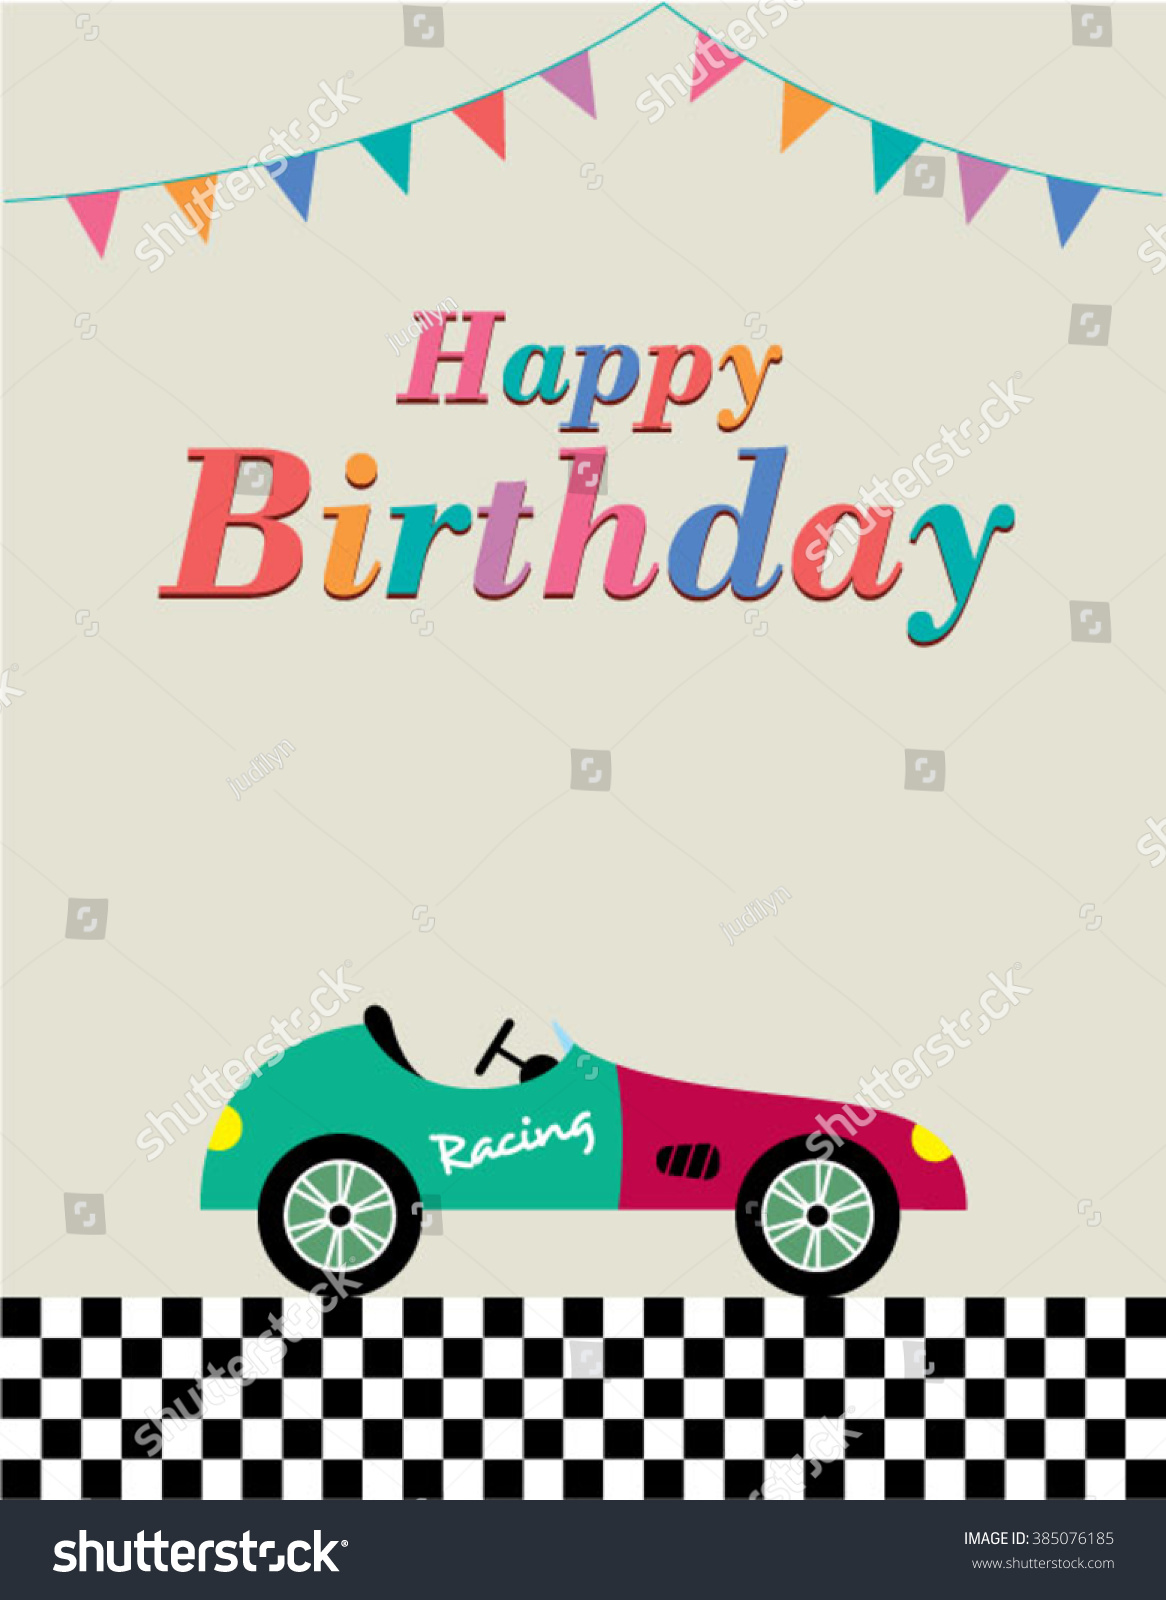 Vintage Race Car Happy Birthday Greeting Stock Vector Royalty Free 385076185